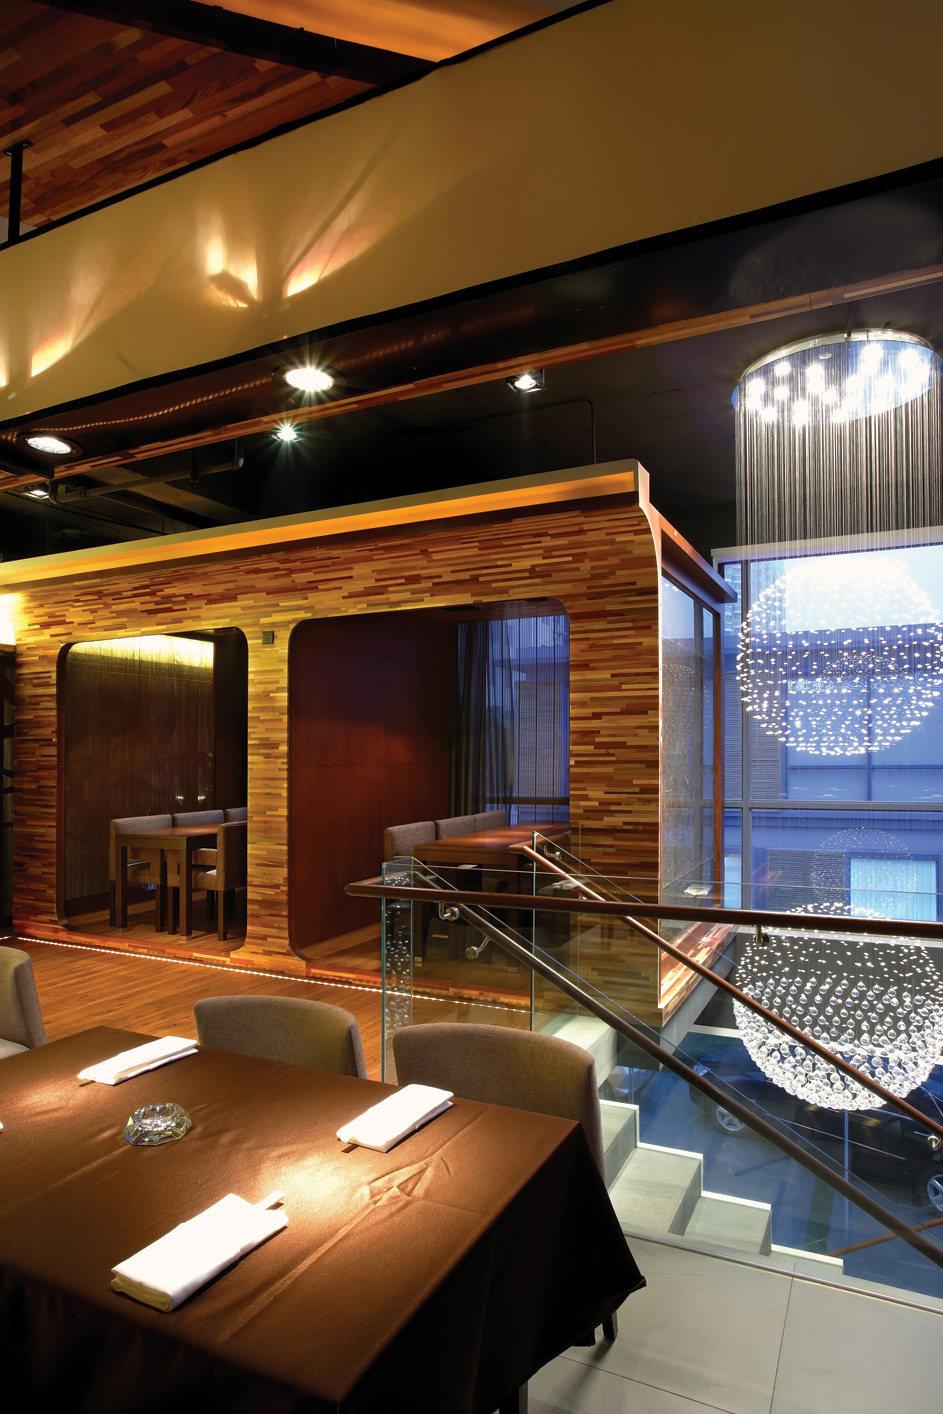 Top restaurant design 高级餐饮空间案例_(谢)史宾瑟创意日本料理店 a (16).jpg